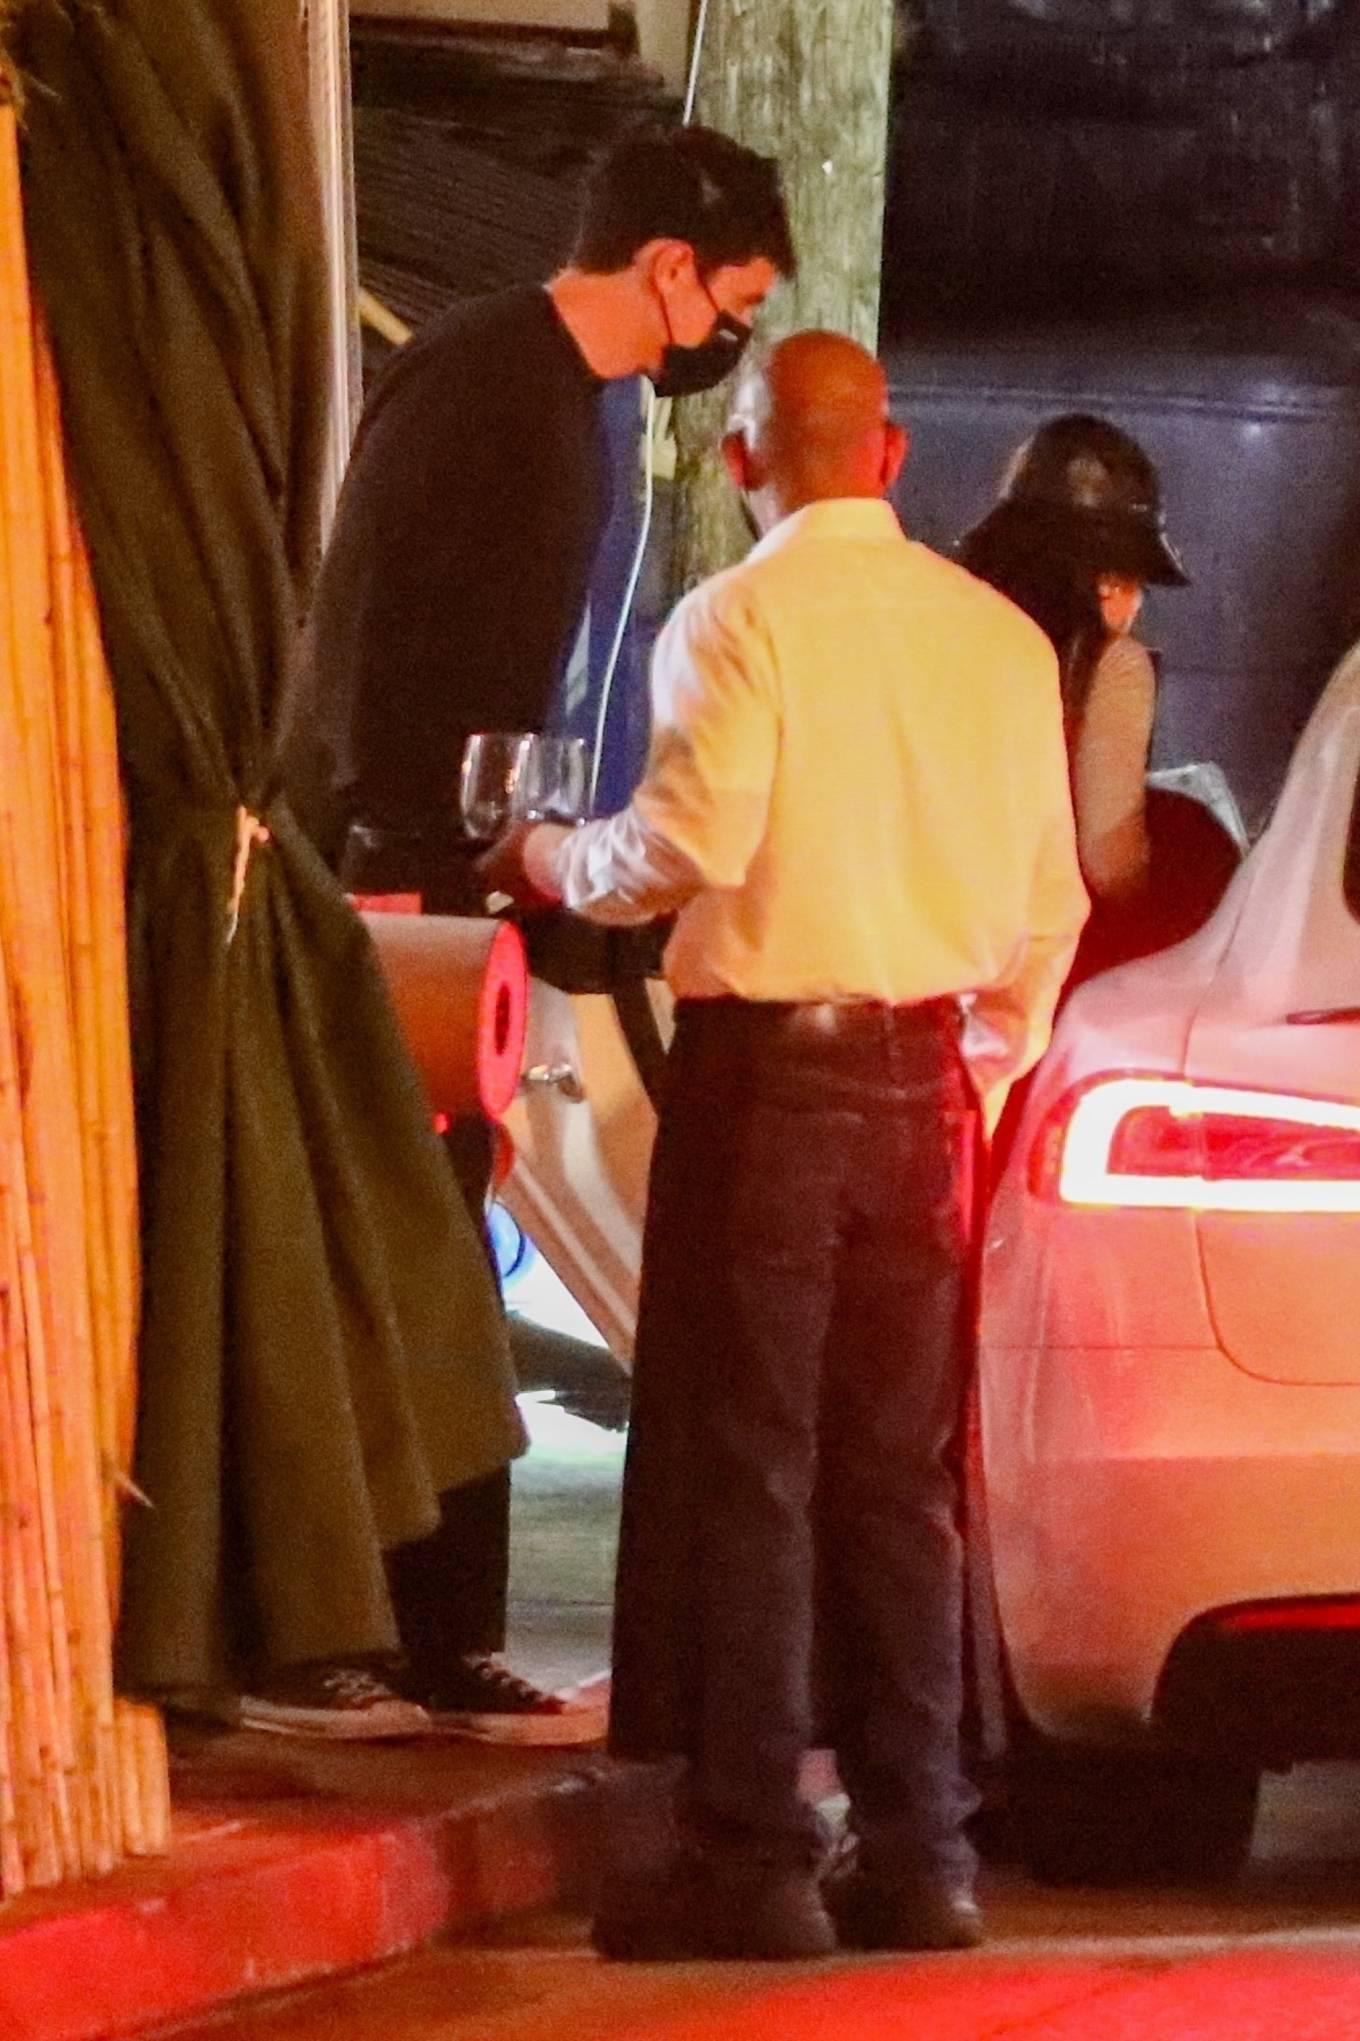 Ariana Grande 2021 : Ariana Grande – Dinner date with fiance Dalton Gomez in Los Angeles-01